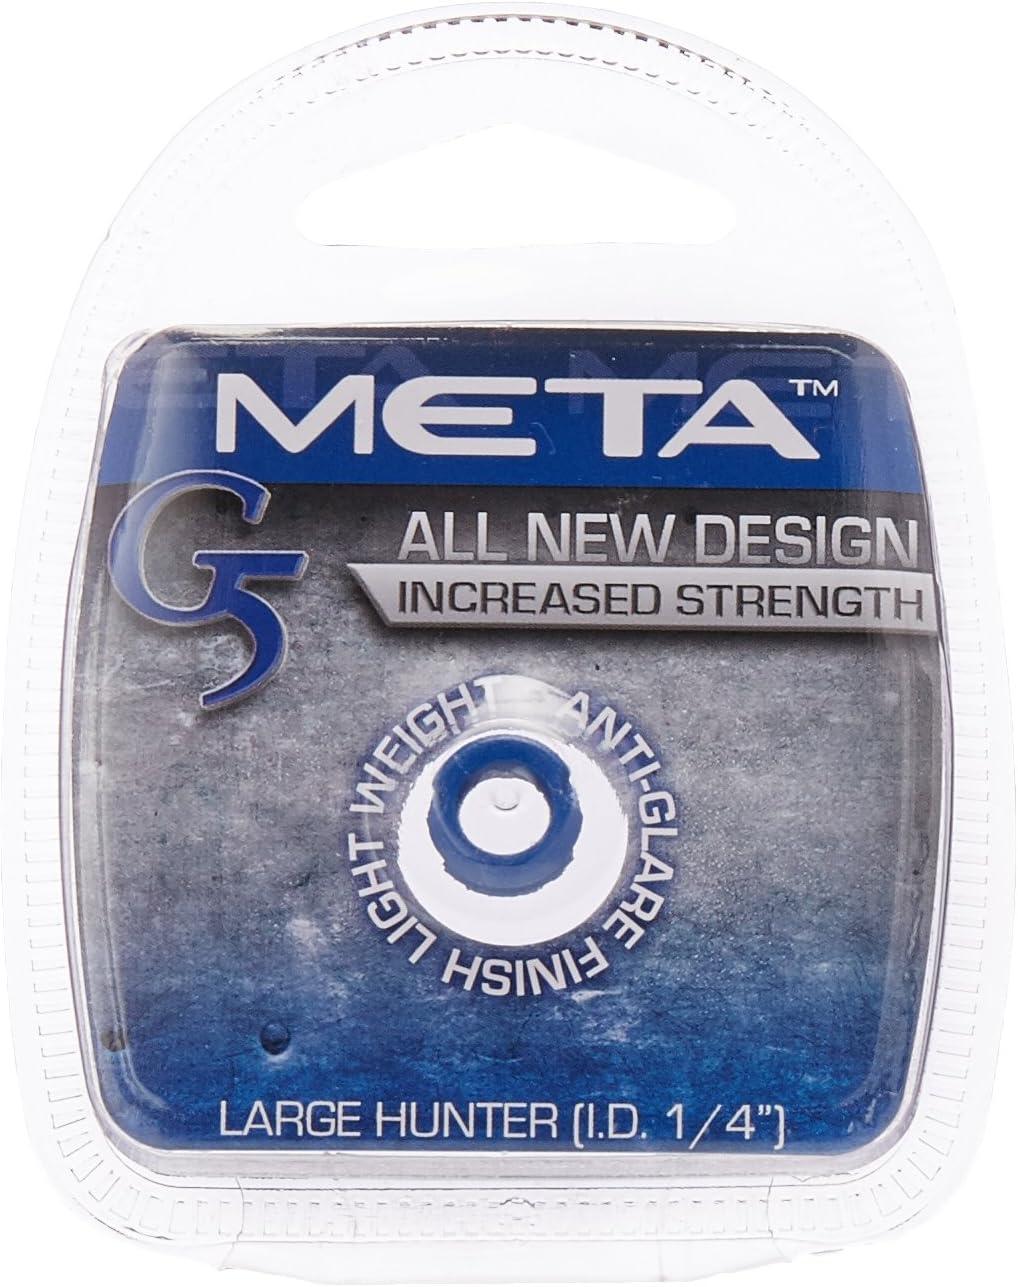 G5 Outdoors High quality Meta Peeps favorite